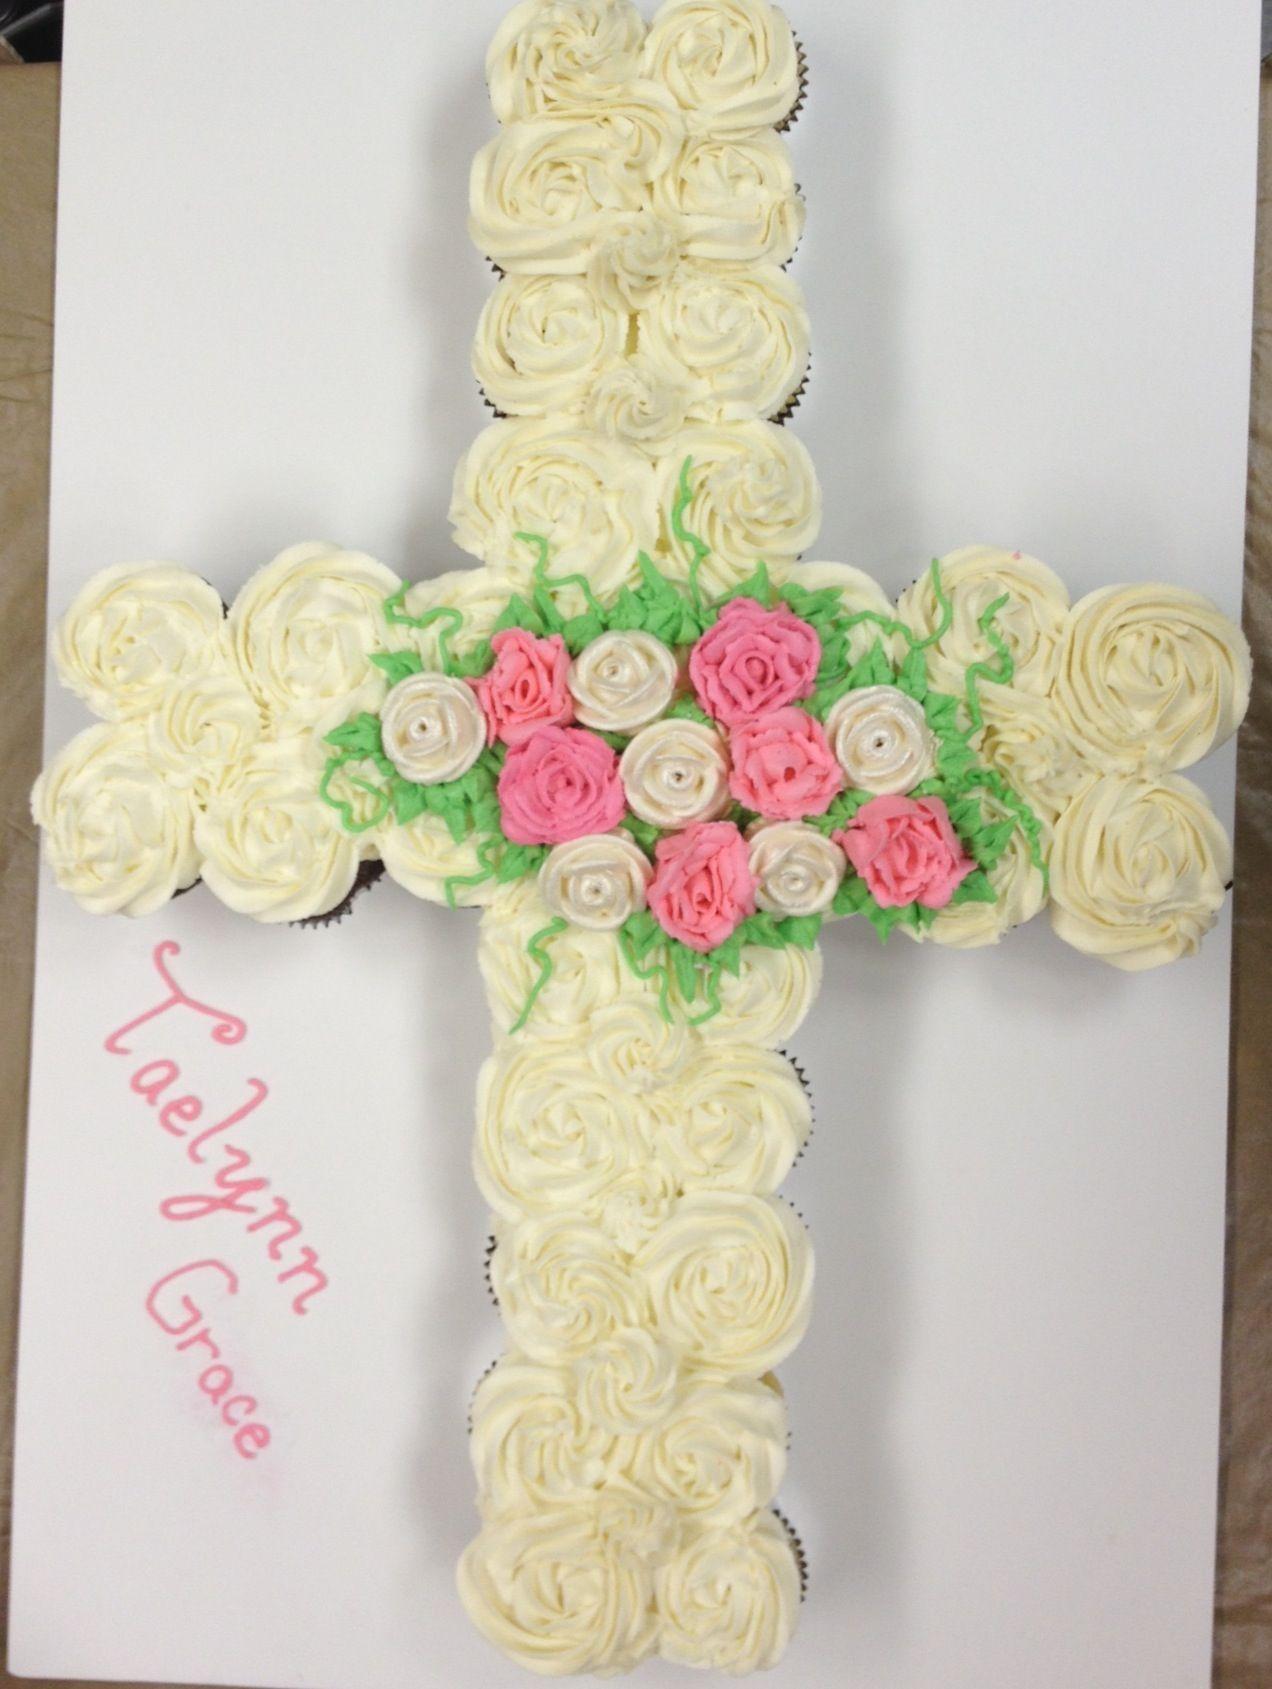 Pin By Kathy Binkley On Baptism